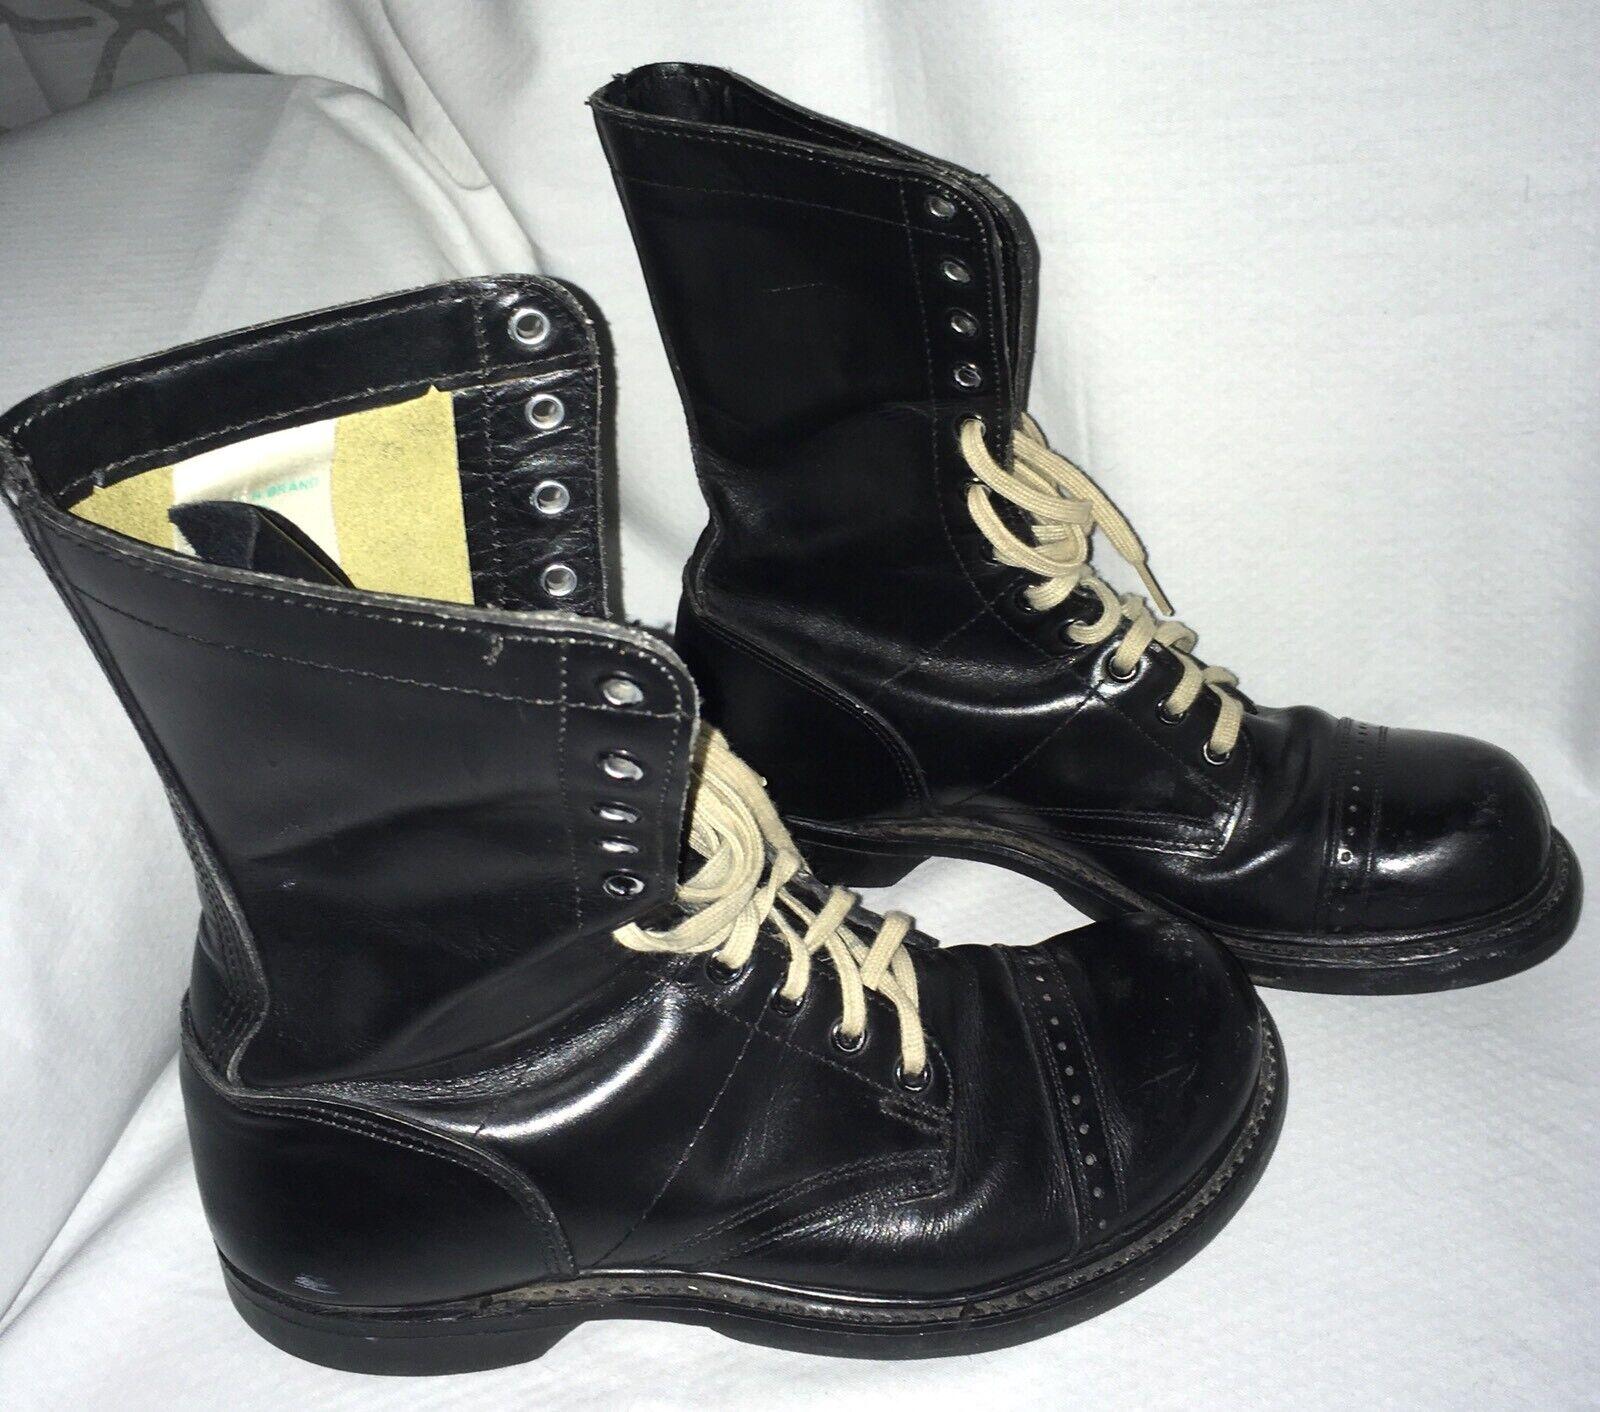 Vintage DOUBLE H Men's Black Leather Jump Boots 7 1 2 D Army Paratrooper Style